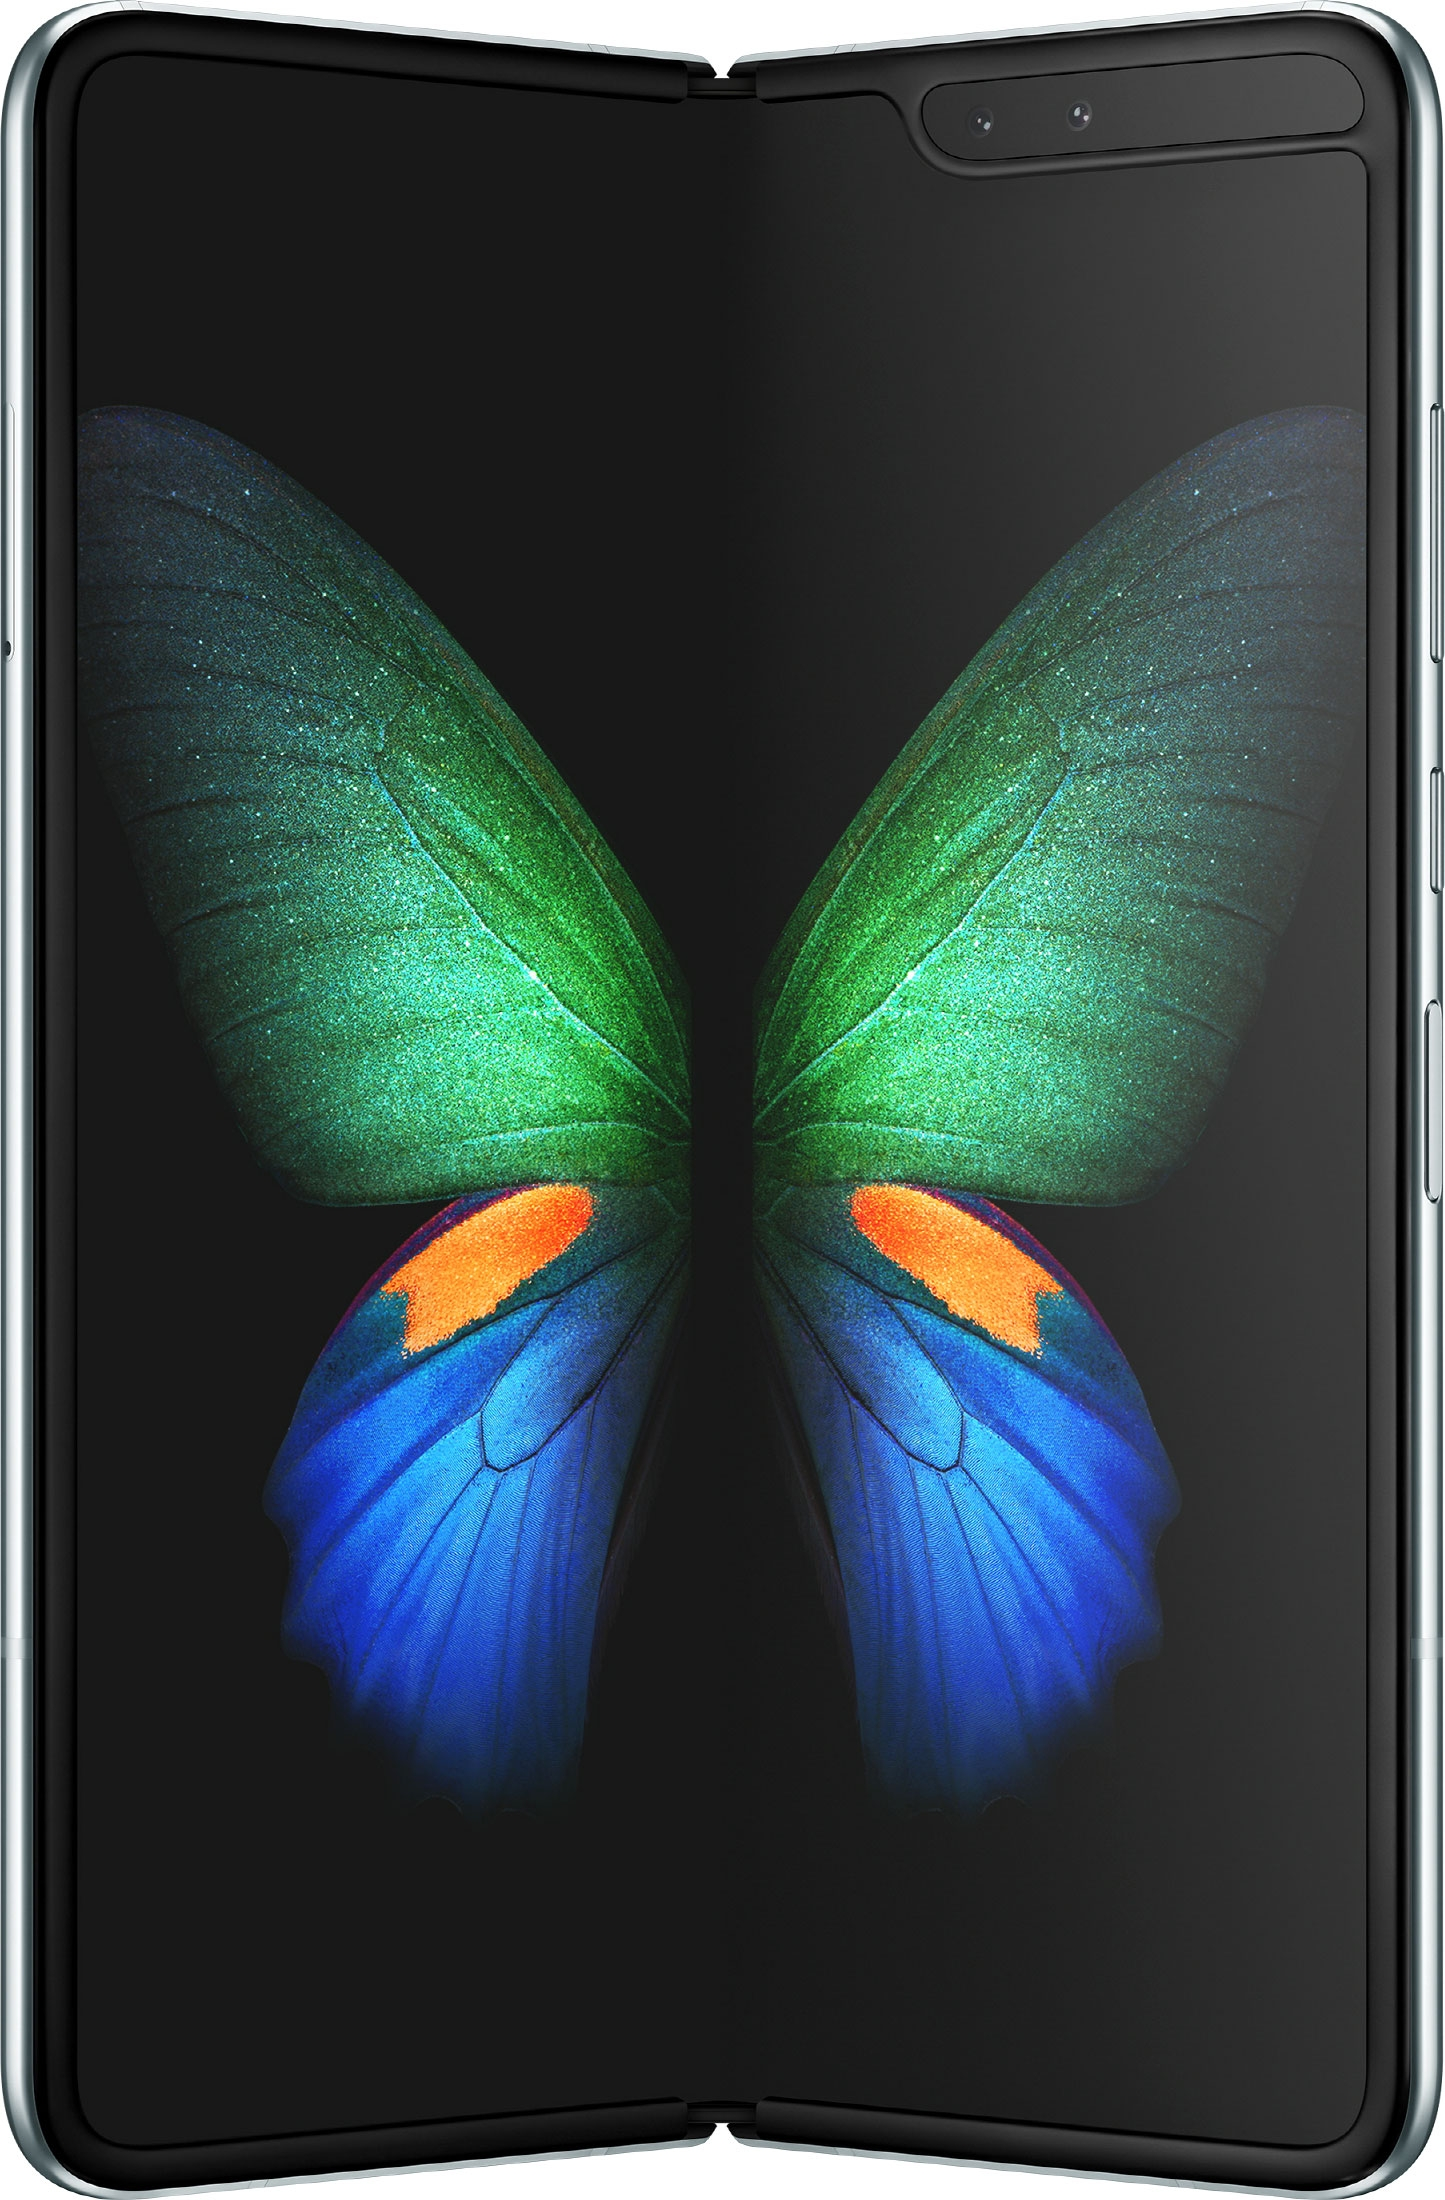 Смартфон Samsung Galaxy Fold 5G: где купить, цены, характеристики